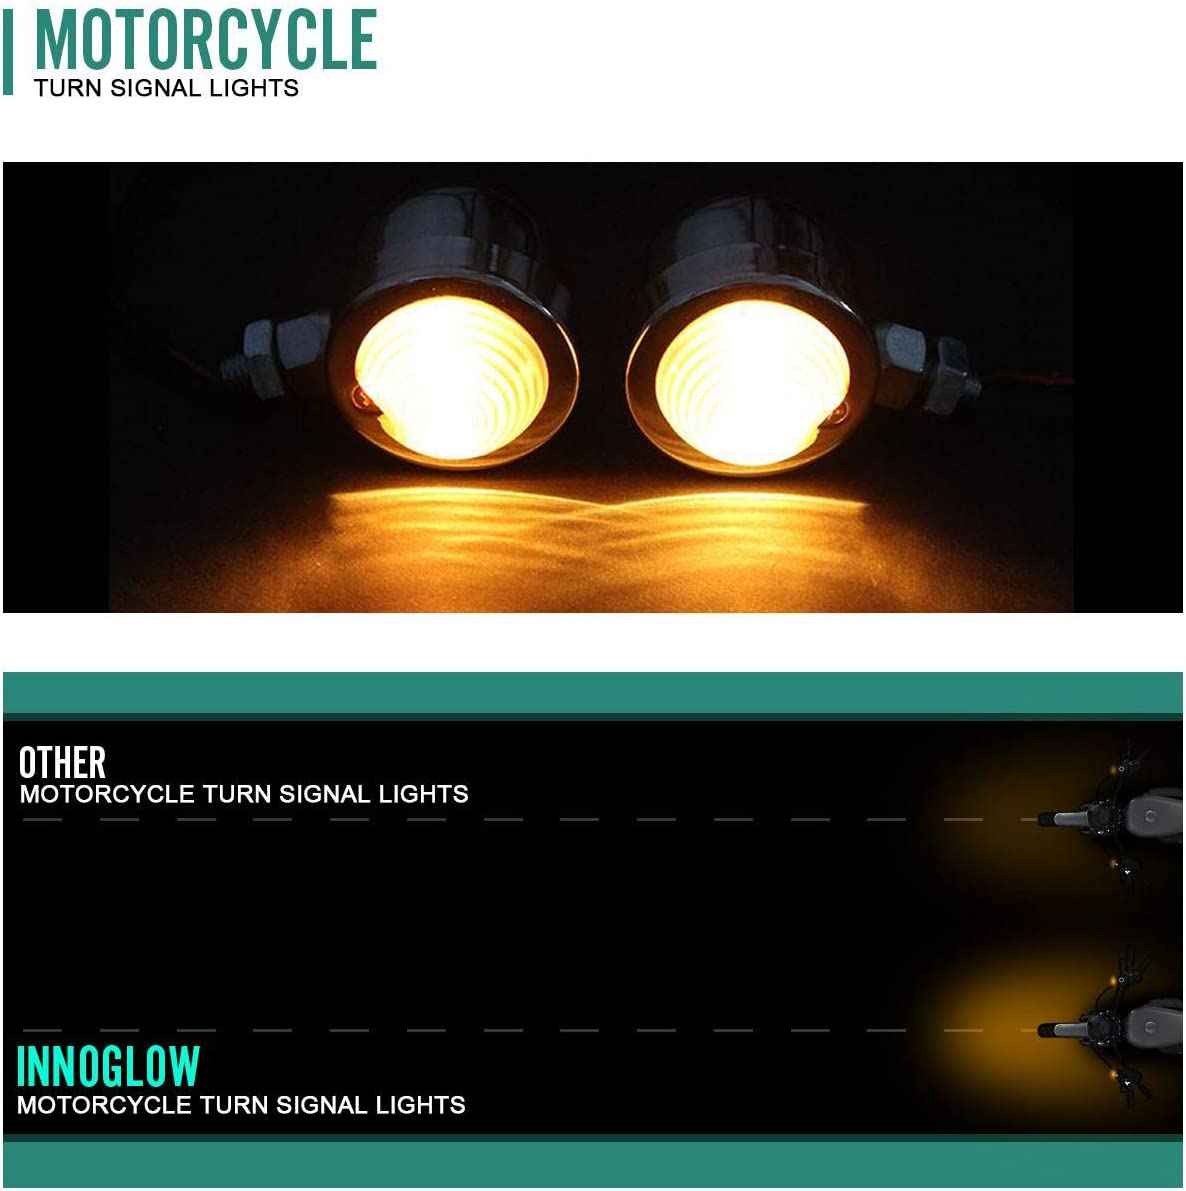 INNOGLOW Motorcycle Turn Signals Light 2 Pcs Aftermarket Incandescent Blinkers 3 Wire Chrome Bulb for Harley Honda Yamaha Suzuki Kawasaki